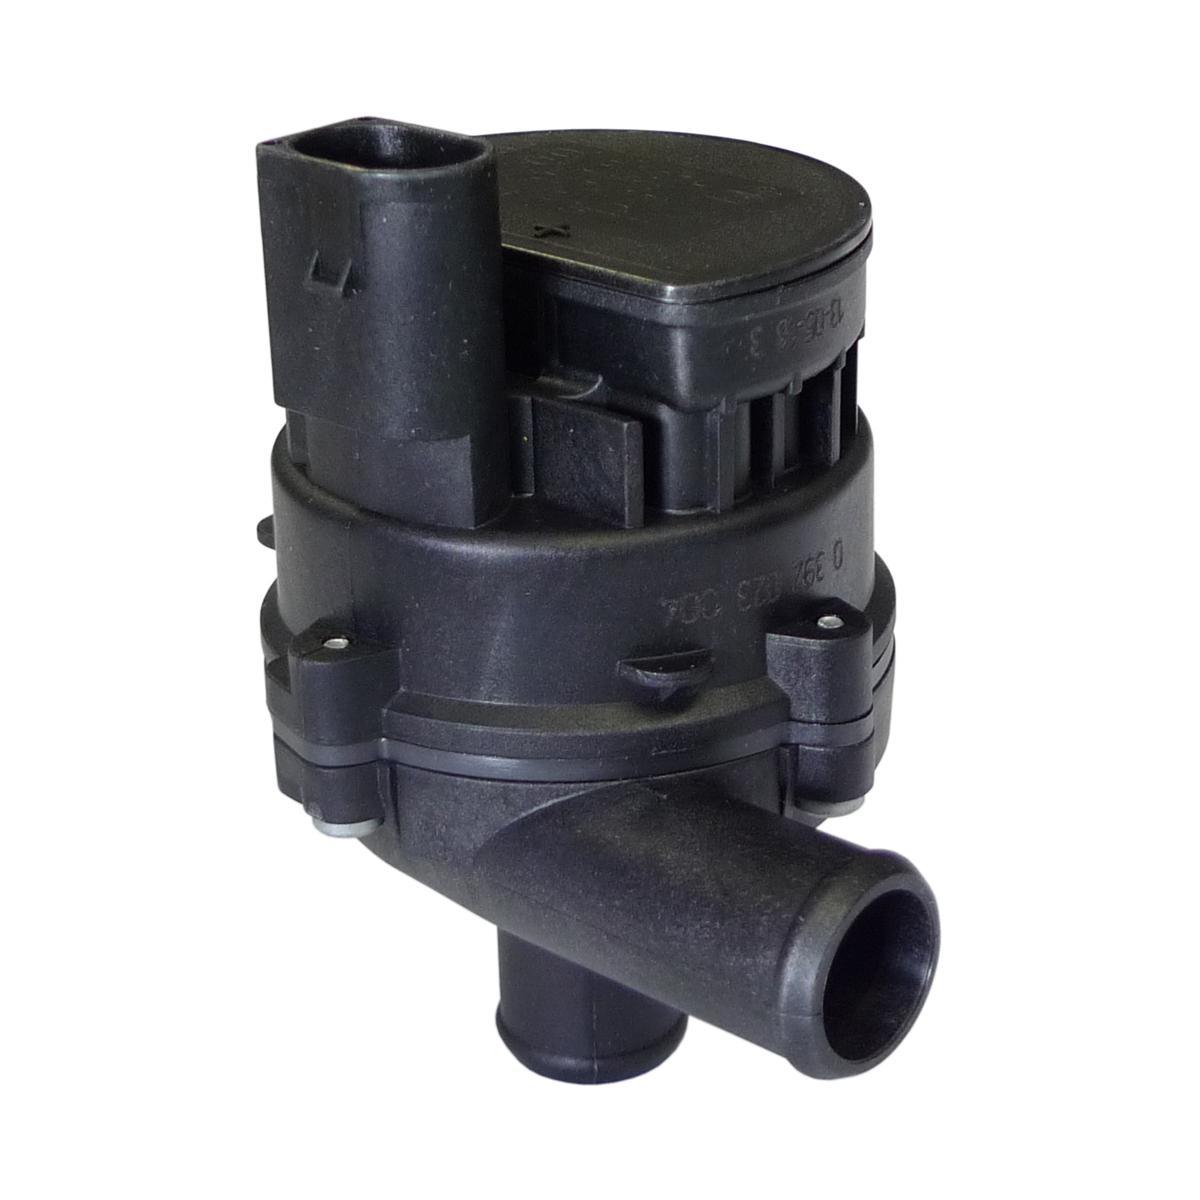 Bomba de agua el ctrica de bosch del motorsport de merlin - Bomba agua electrica ...